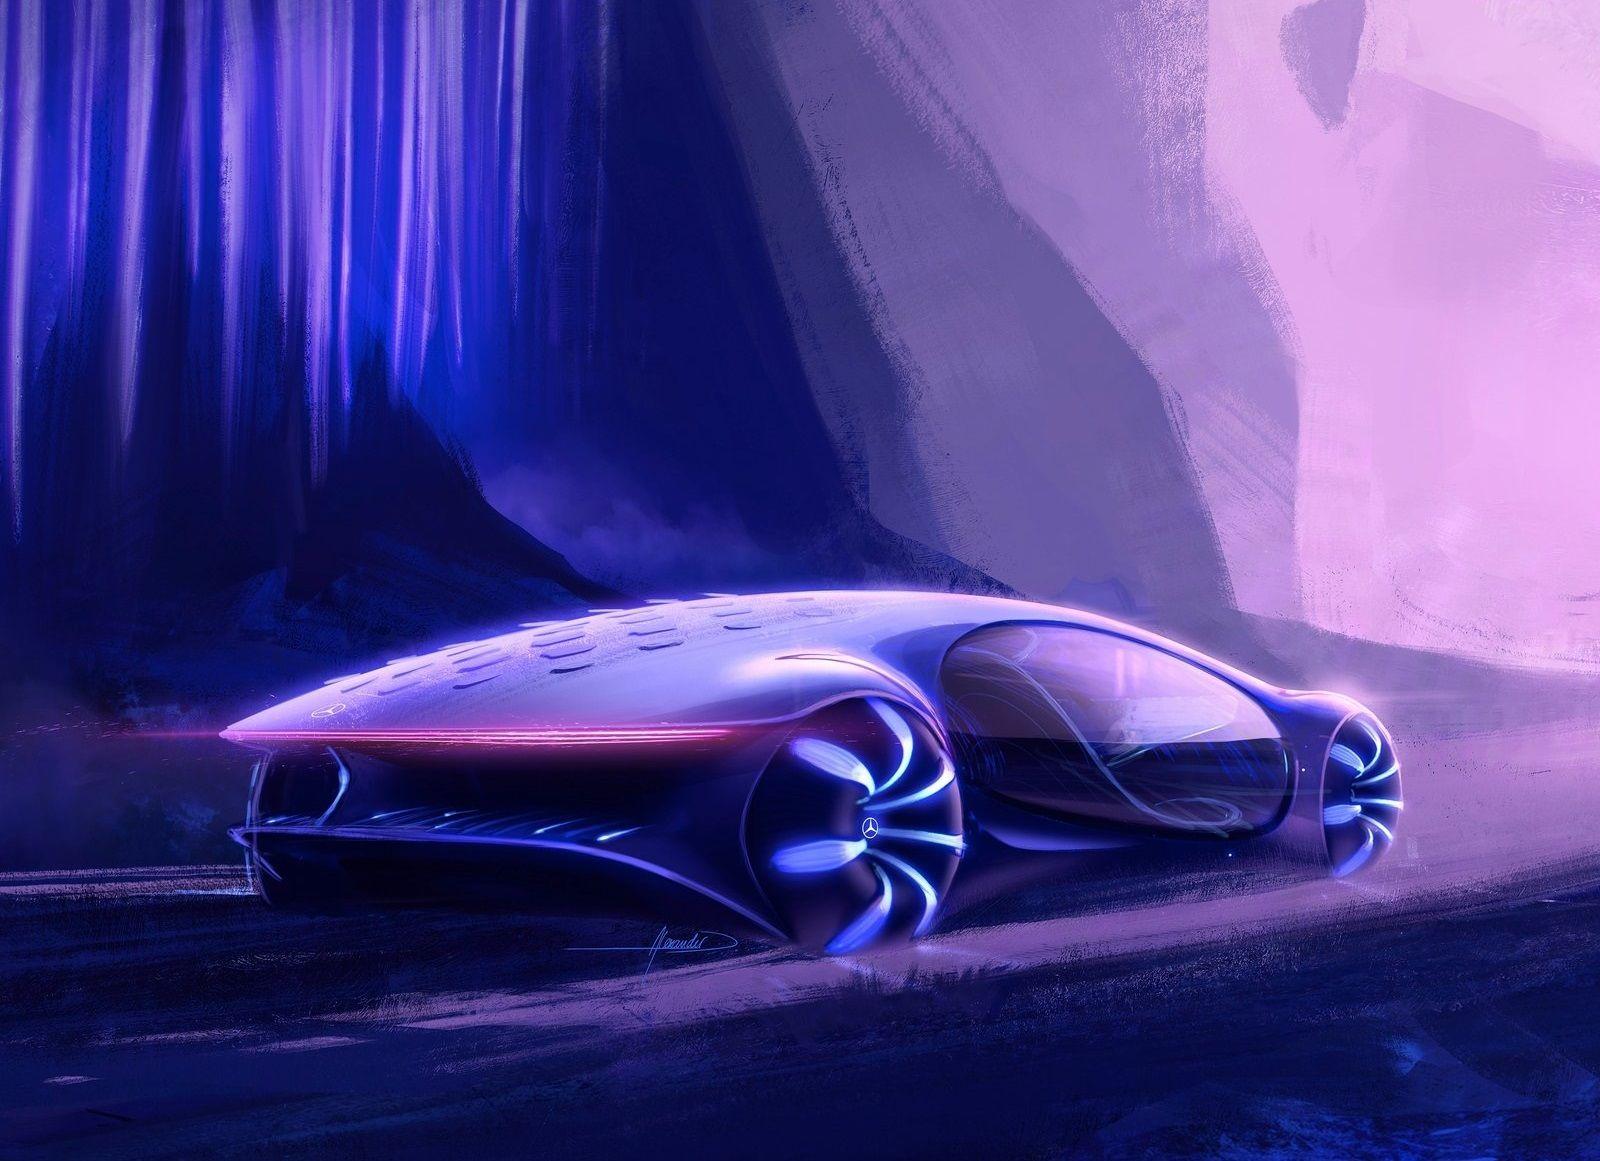 2020 Mercedes Benz Vision Avtr In 2020 Car Car Design Sketch Benz